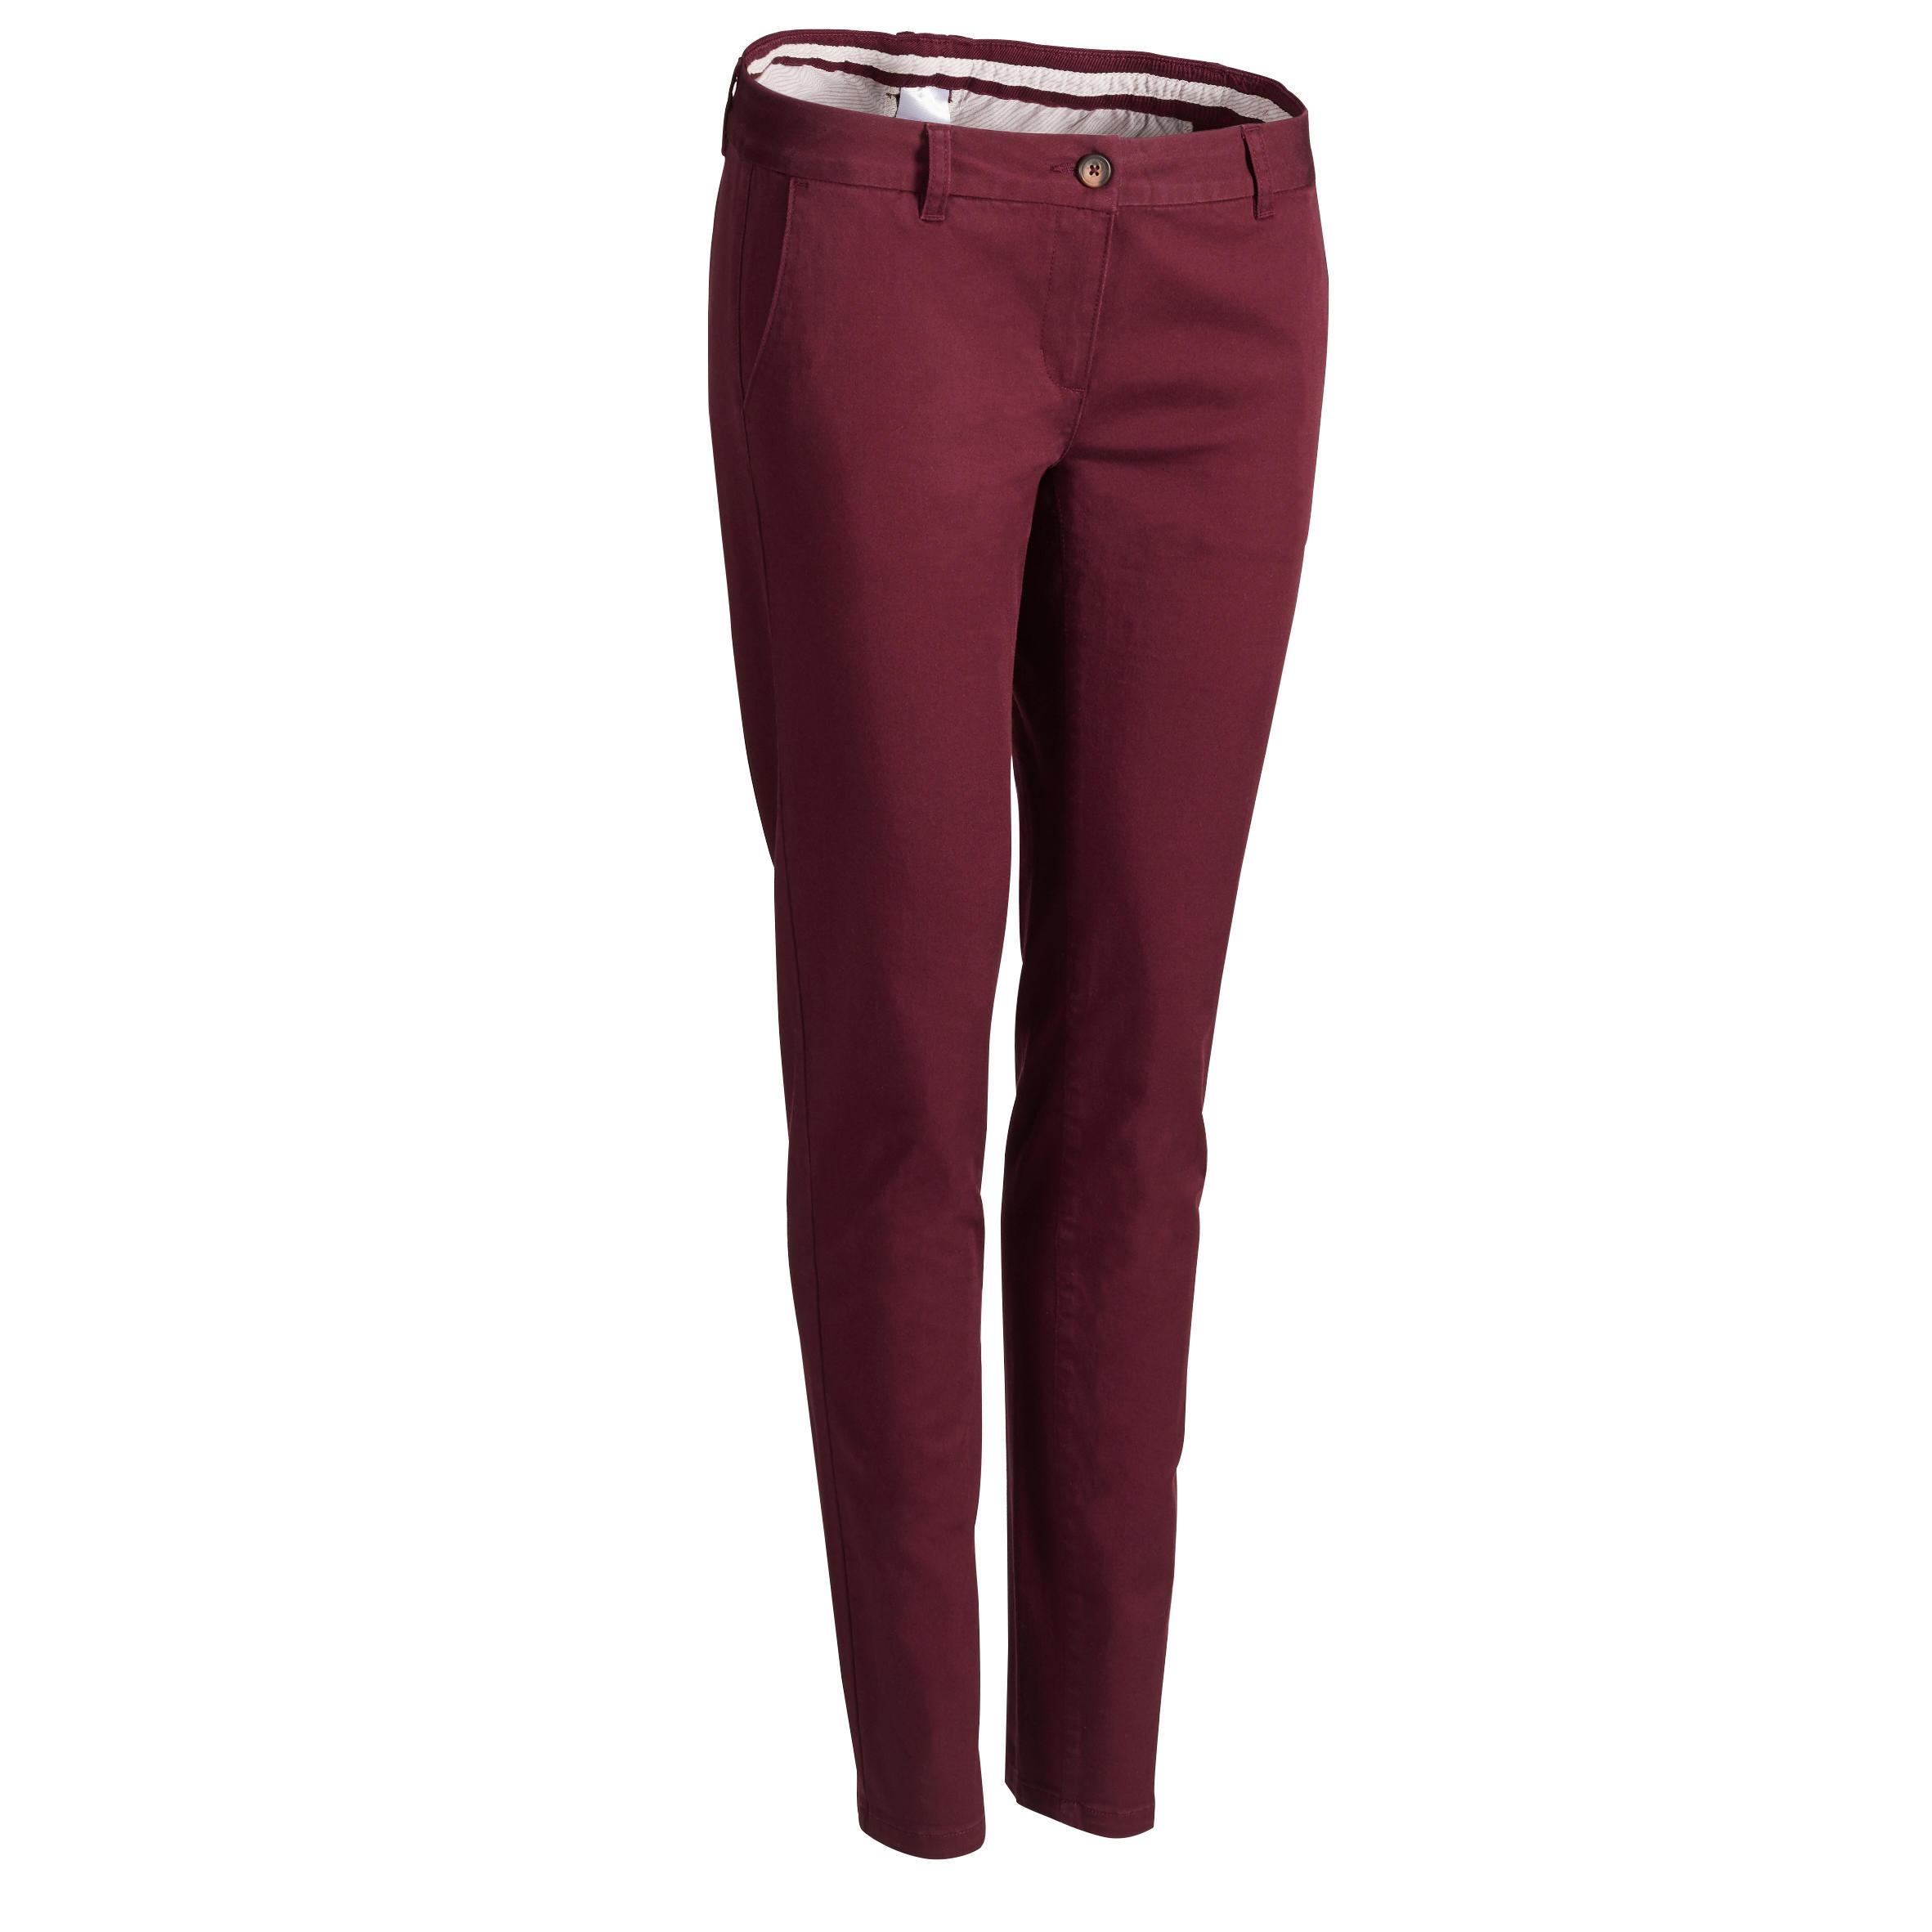 Pantalon golf MW Damă imagine